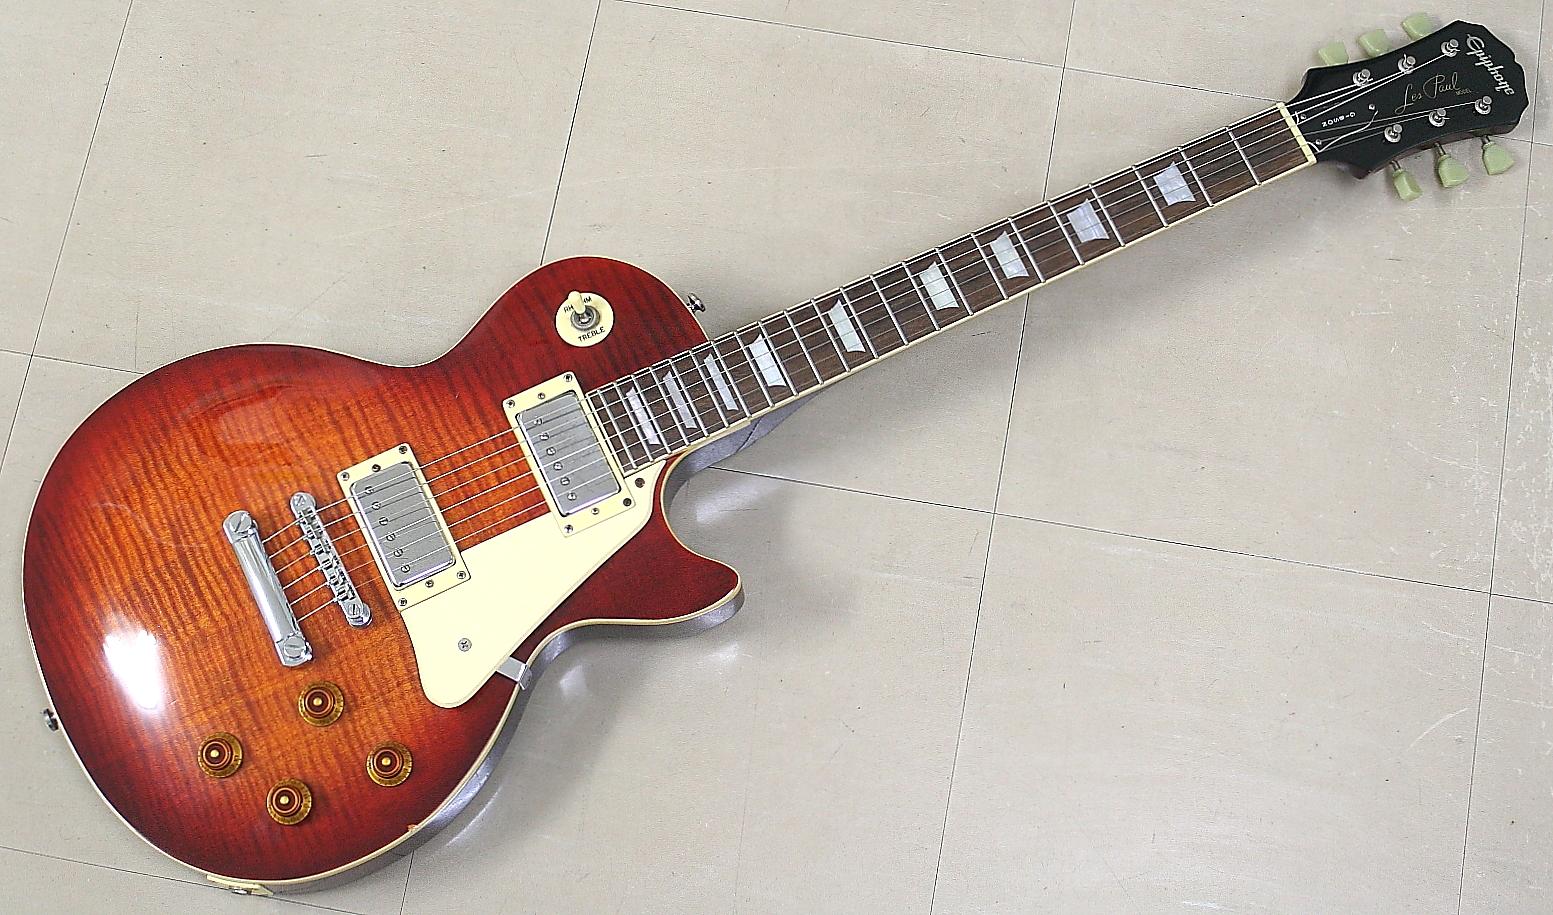 Epiphone エレキギター Les Paul Standard